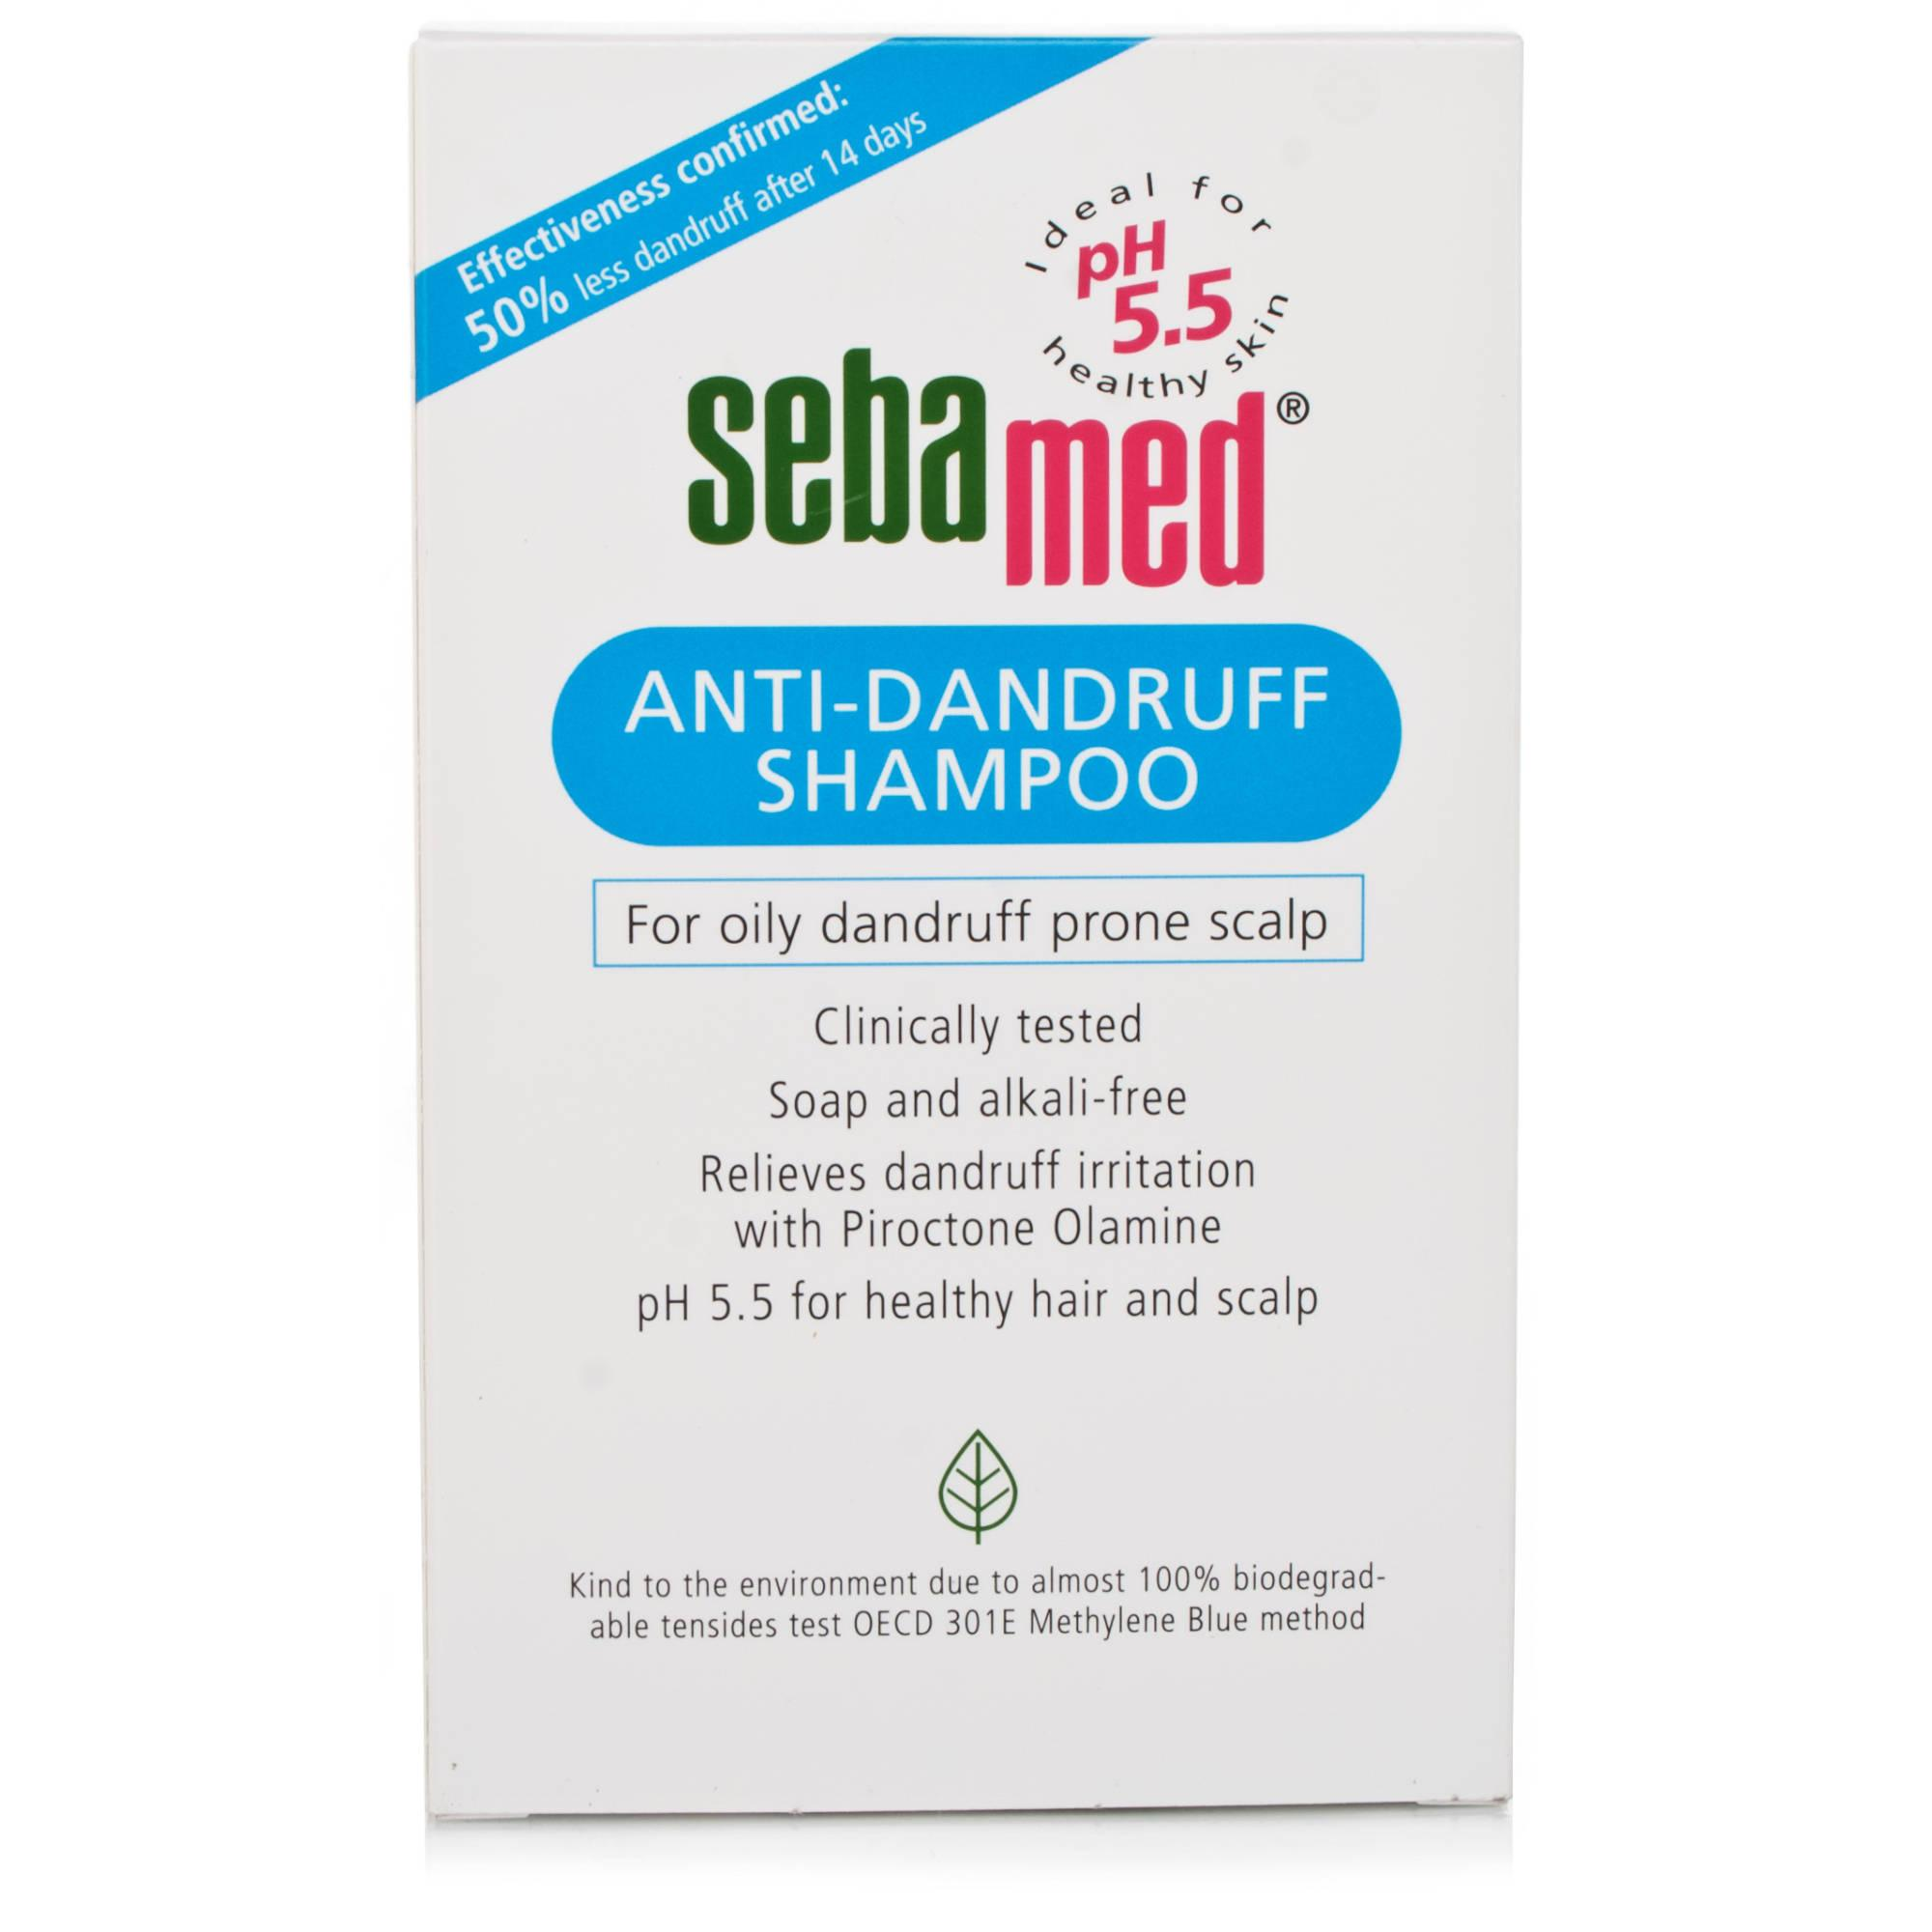 Sebamed - Anti-Dandruff Shampoo (Choose Size)